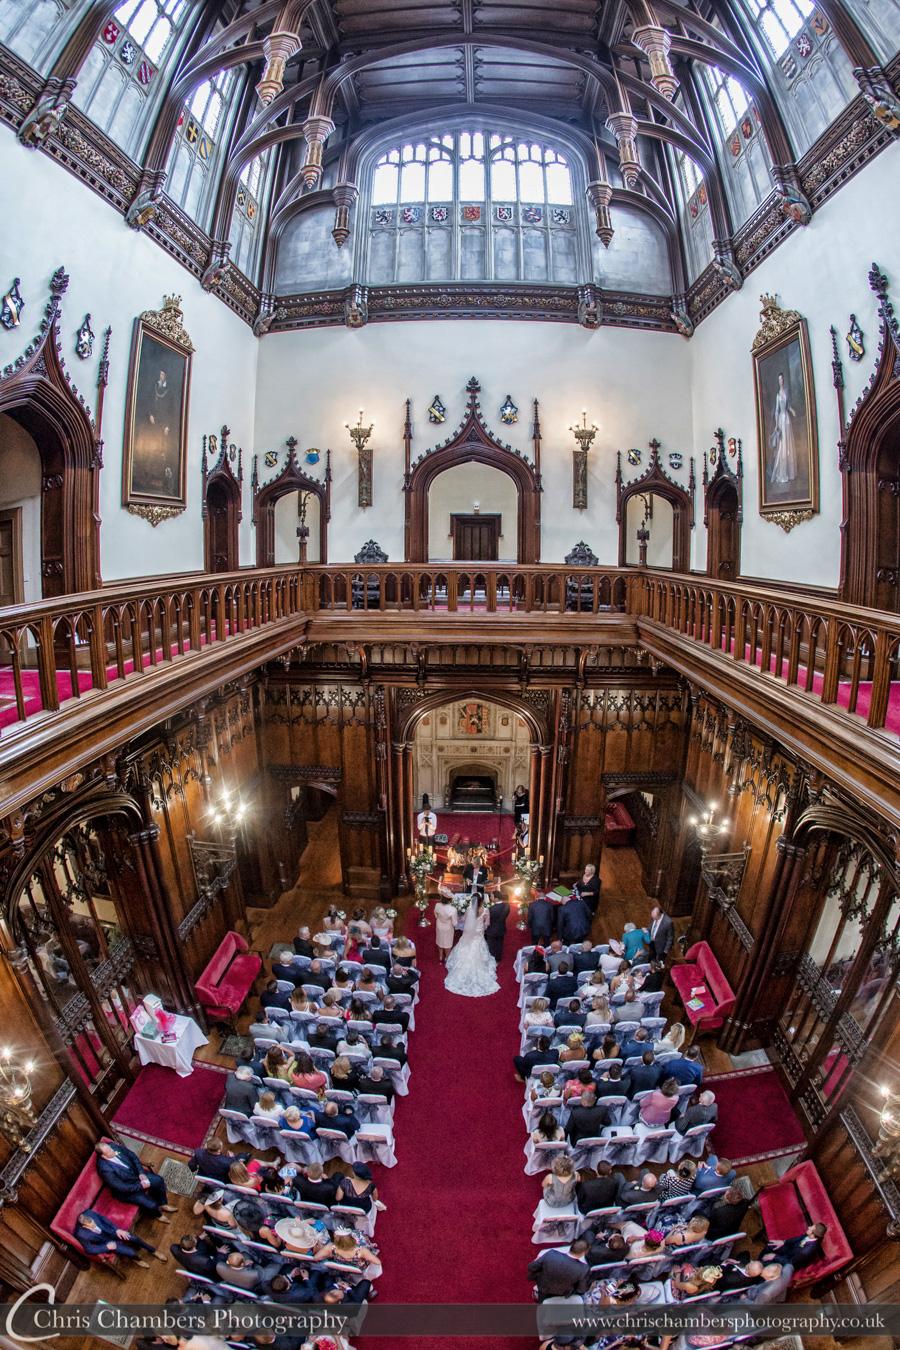 Allerton Castle wedding photography | Chris Chambers photography | Wedding ceremony photography | North Yorkshire wedding photographer | Allerton Castle wedding photography